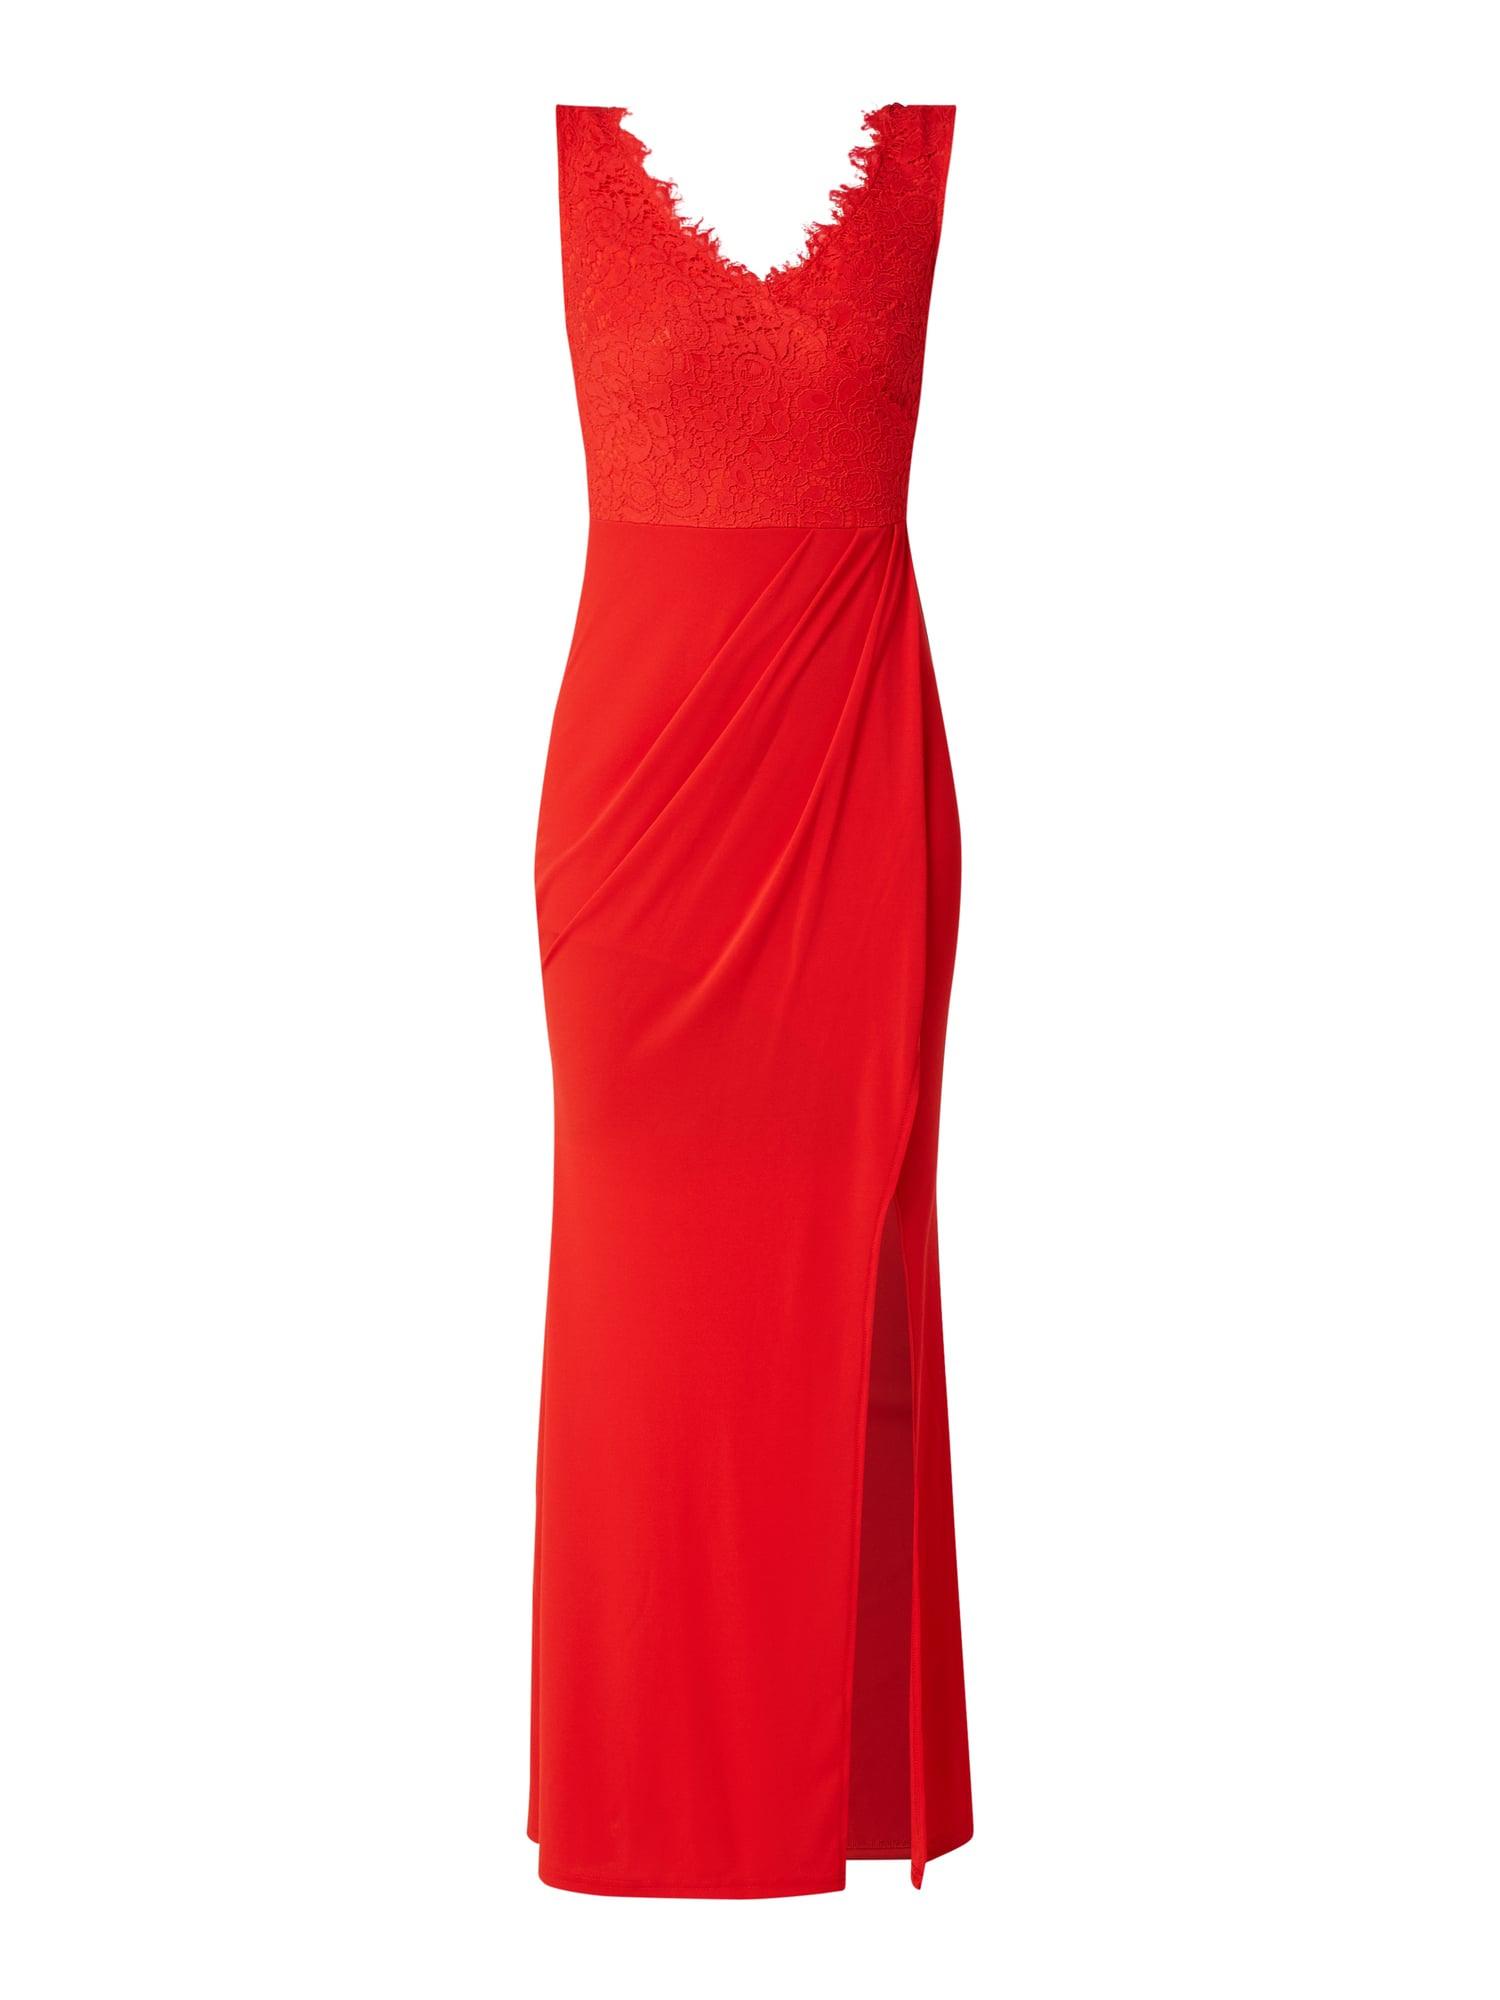 10 Luxurius Lipsy Abendkleid ÄrmelFormal Einfach Lipsy Abendkleid Spezialgebiet